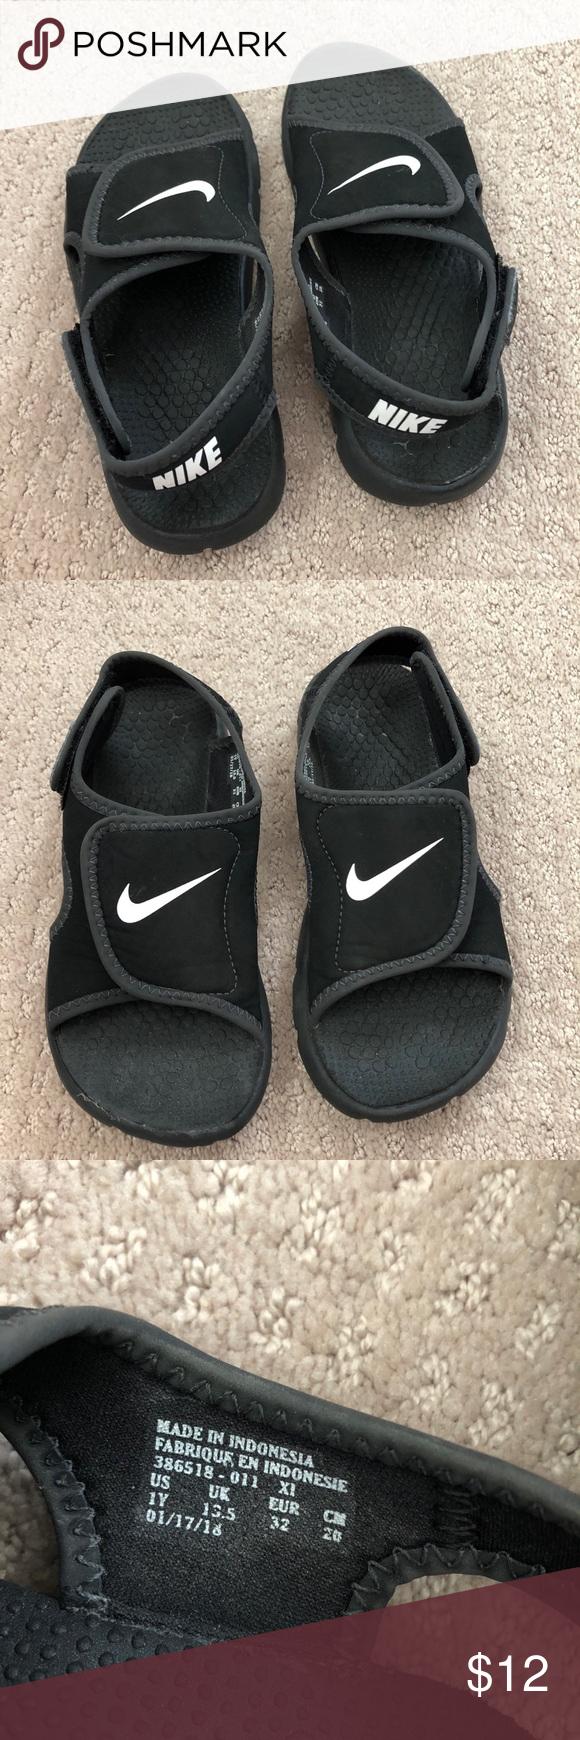 Boys Nike Sunray sandals size 1 | Boys